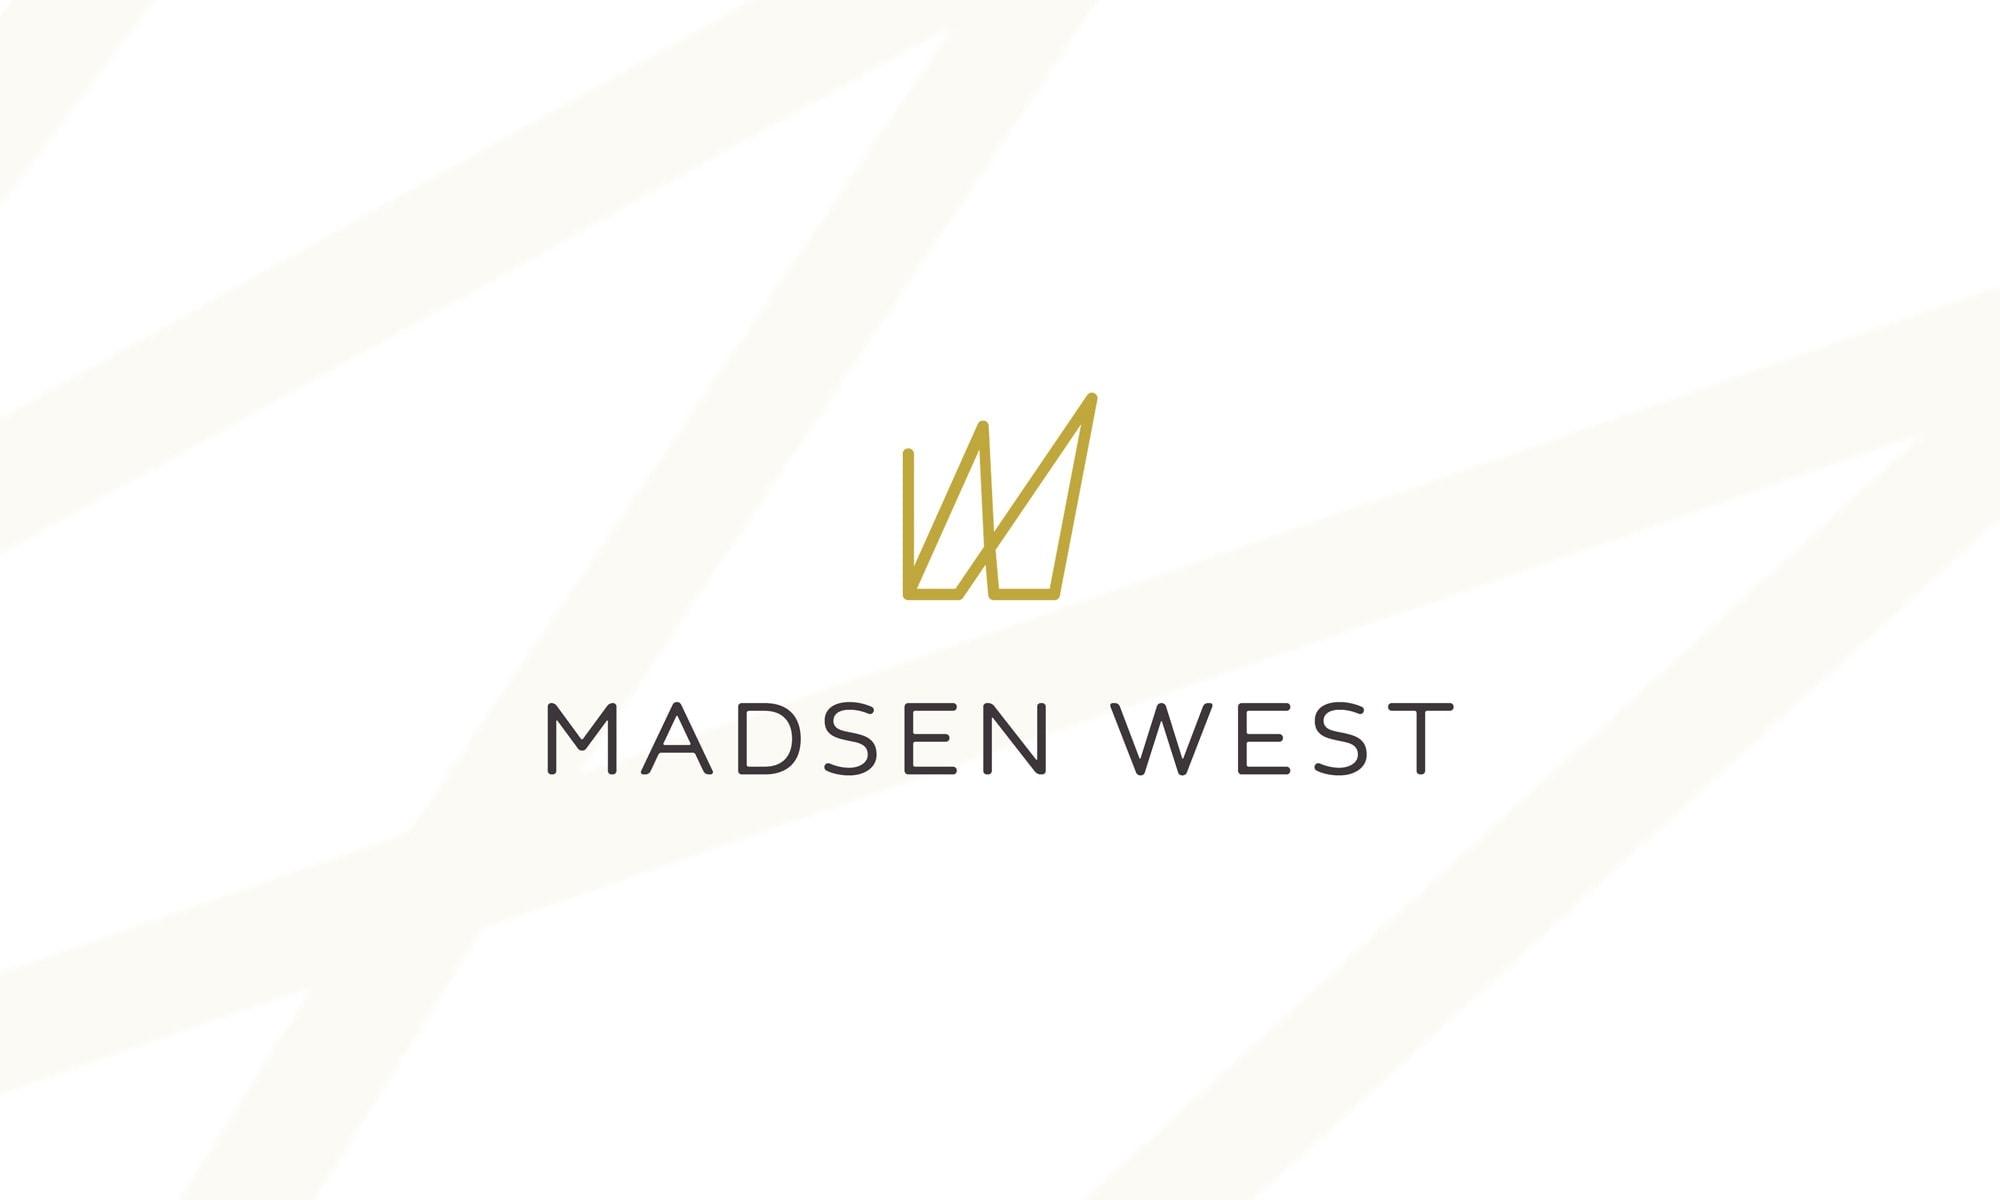 madsen west logo design branding